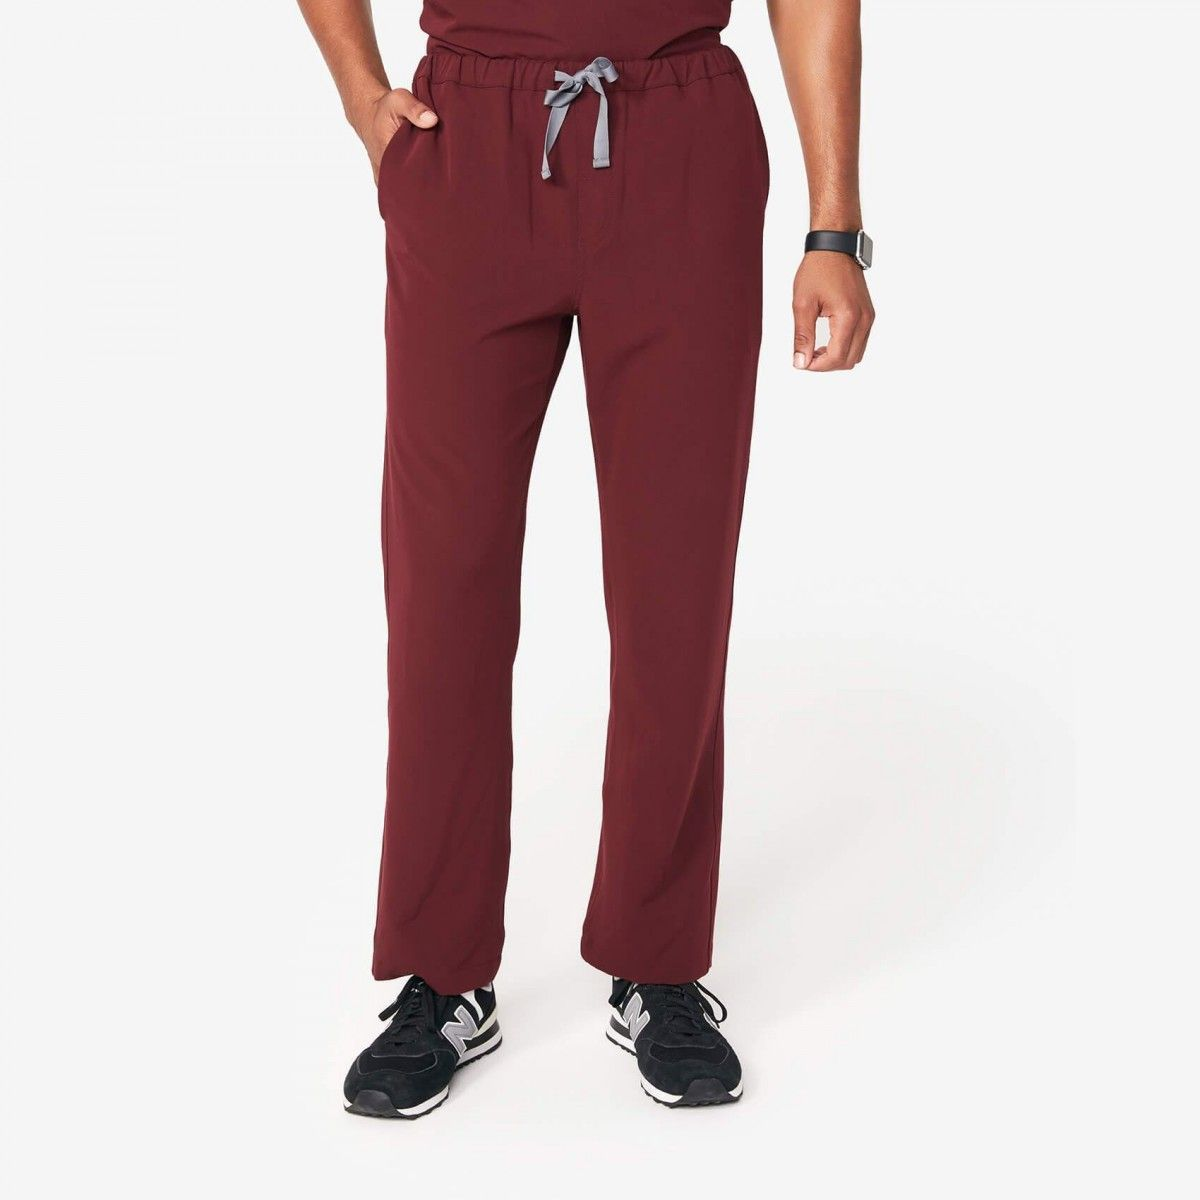 5d573ac0975 BTG - Mens Pisco - Basic Scrub Pants | Products | Scrub pants ...